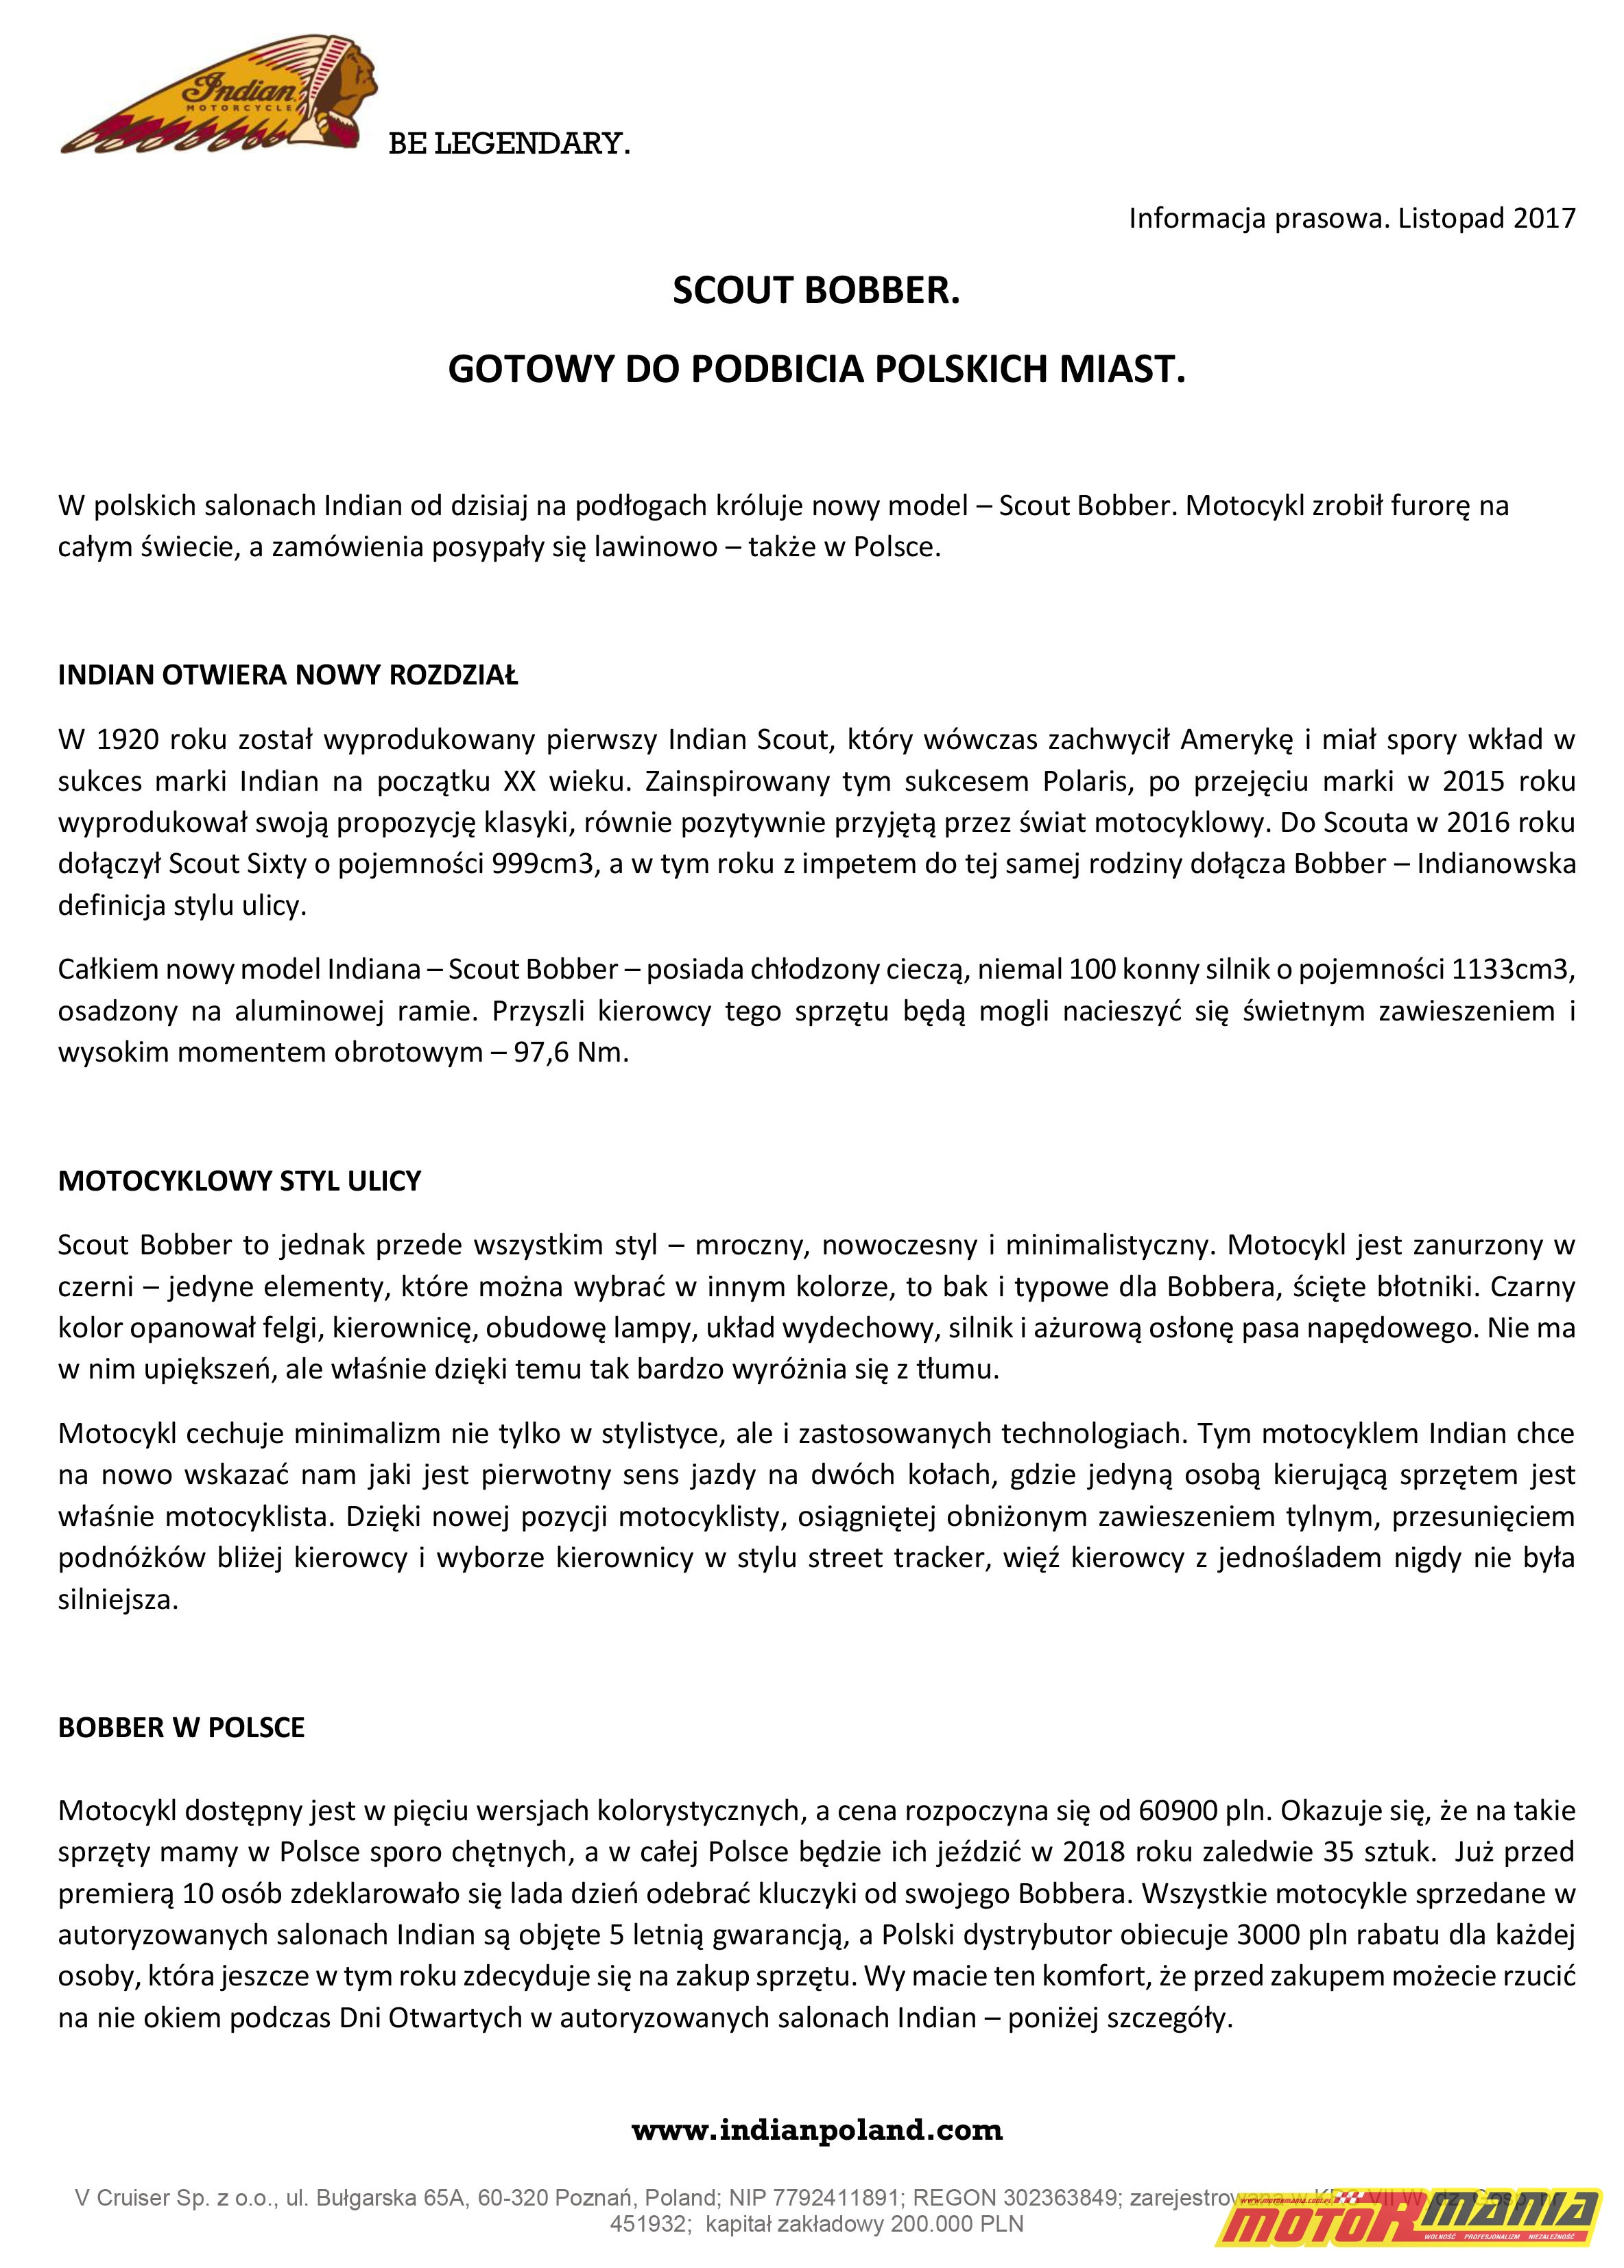 Informacja prasowa Indian Scout Bobber 2018